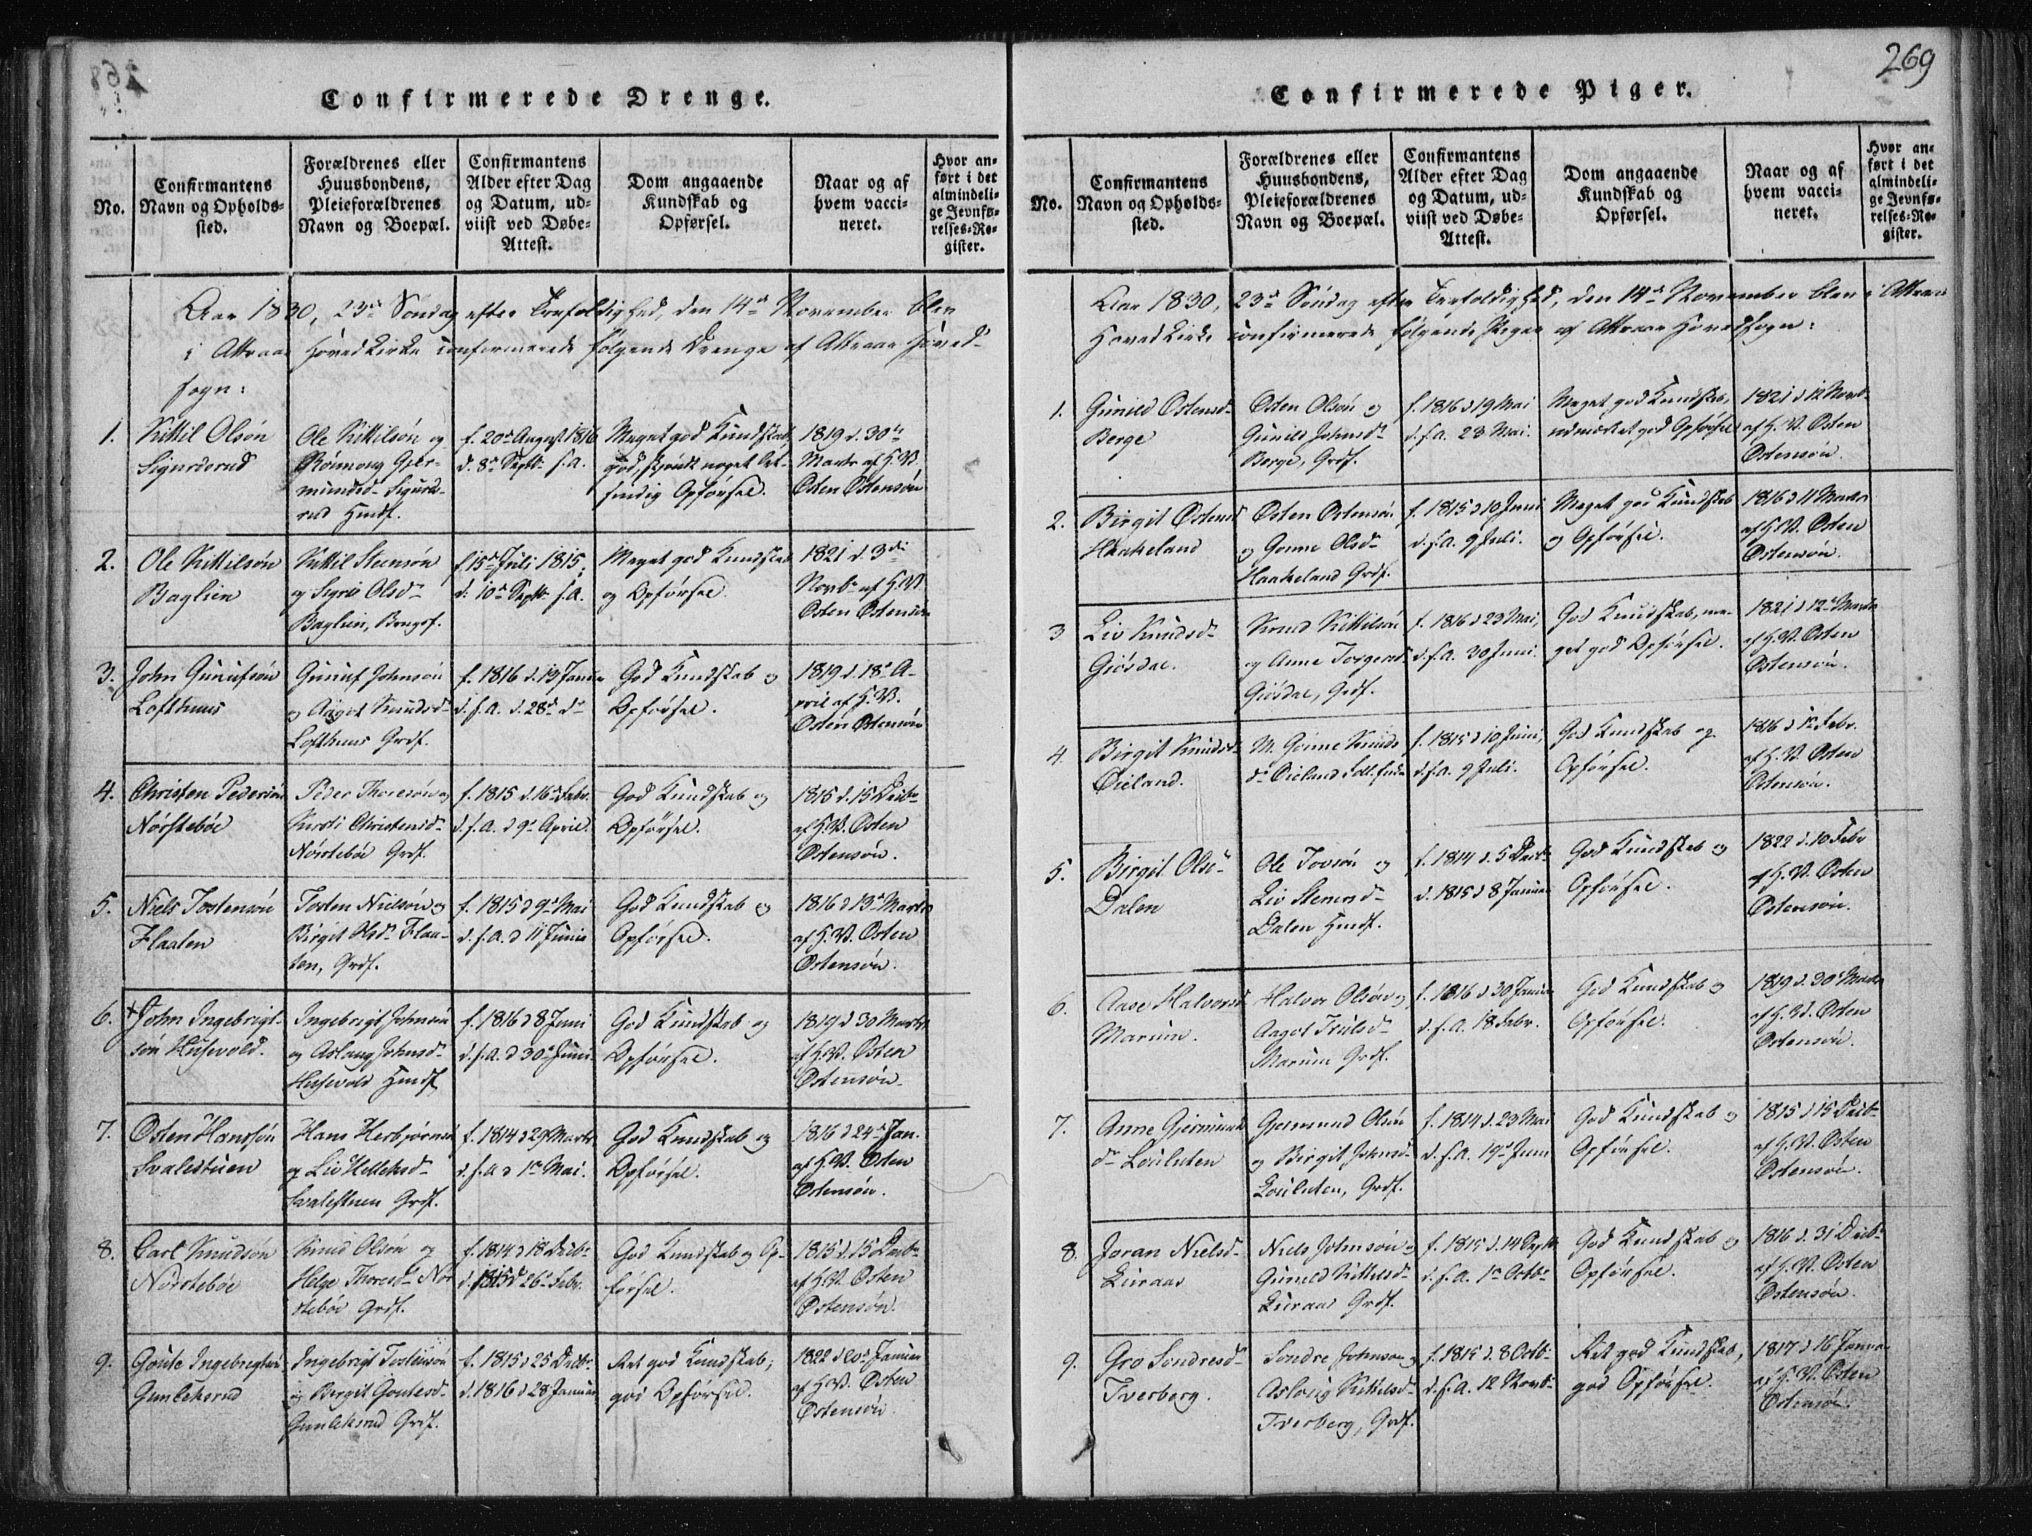 SAKO, Tinn kirkebøker, F/Fa/L0004: Ministerialbok nr. I 4, 1815-1843, s. 269